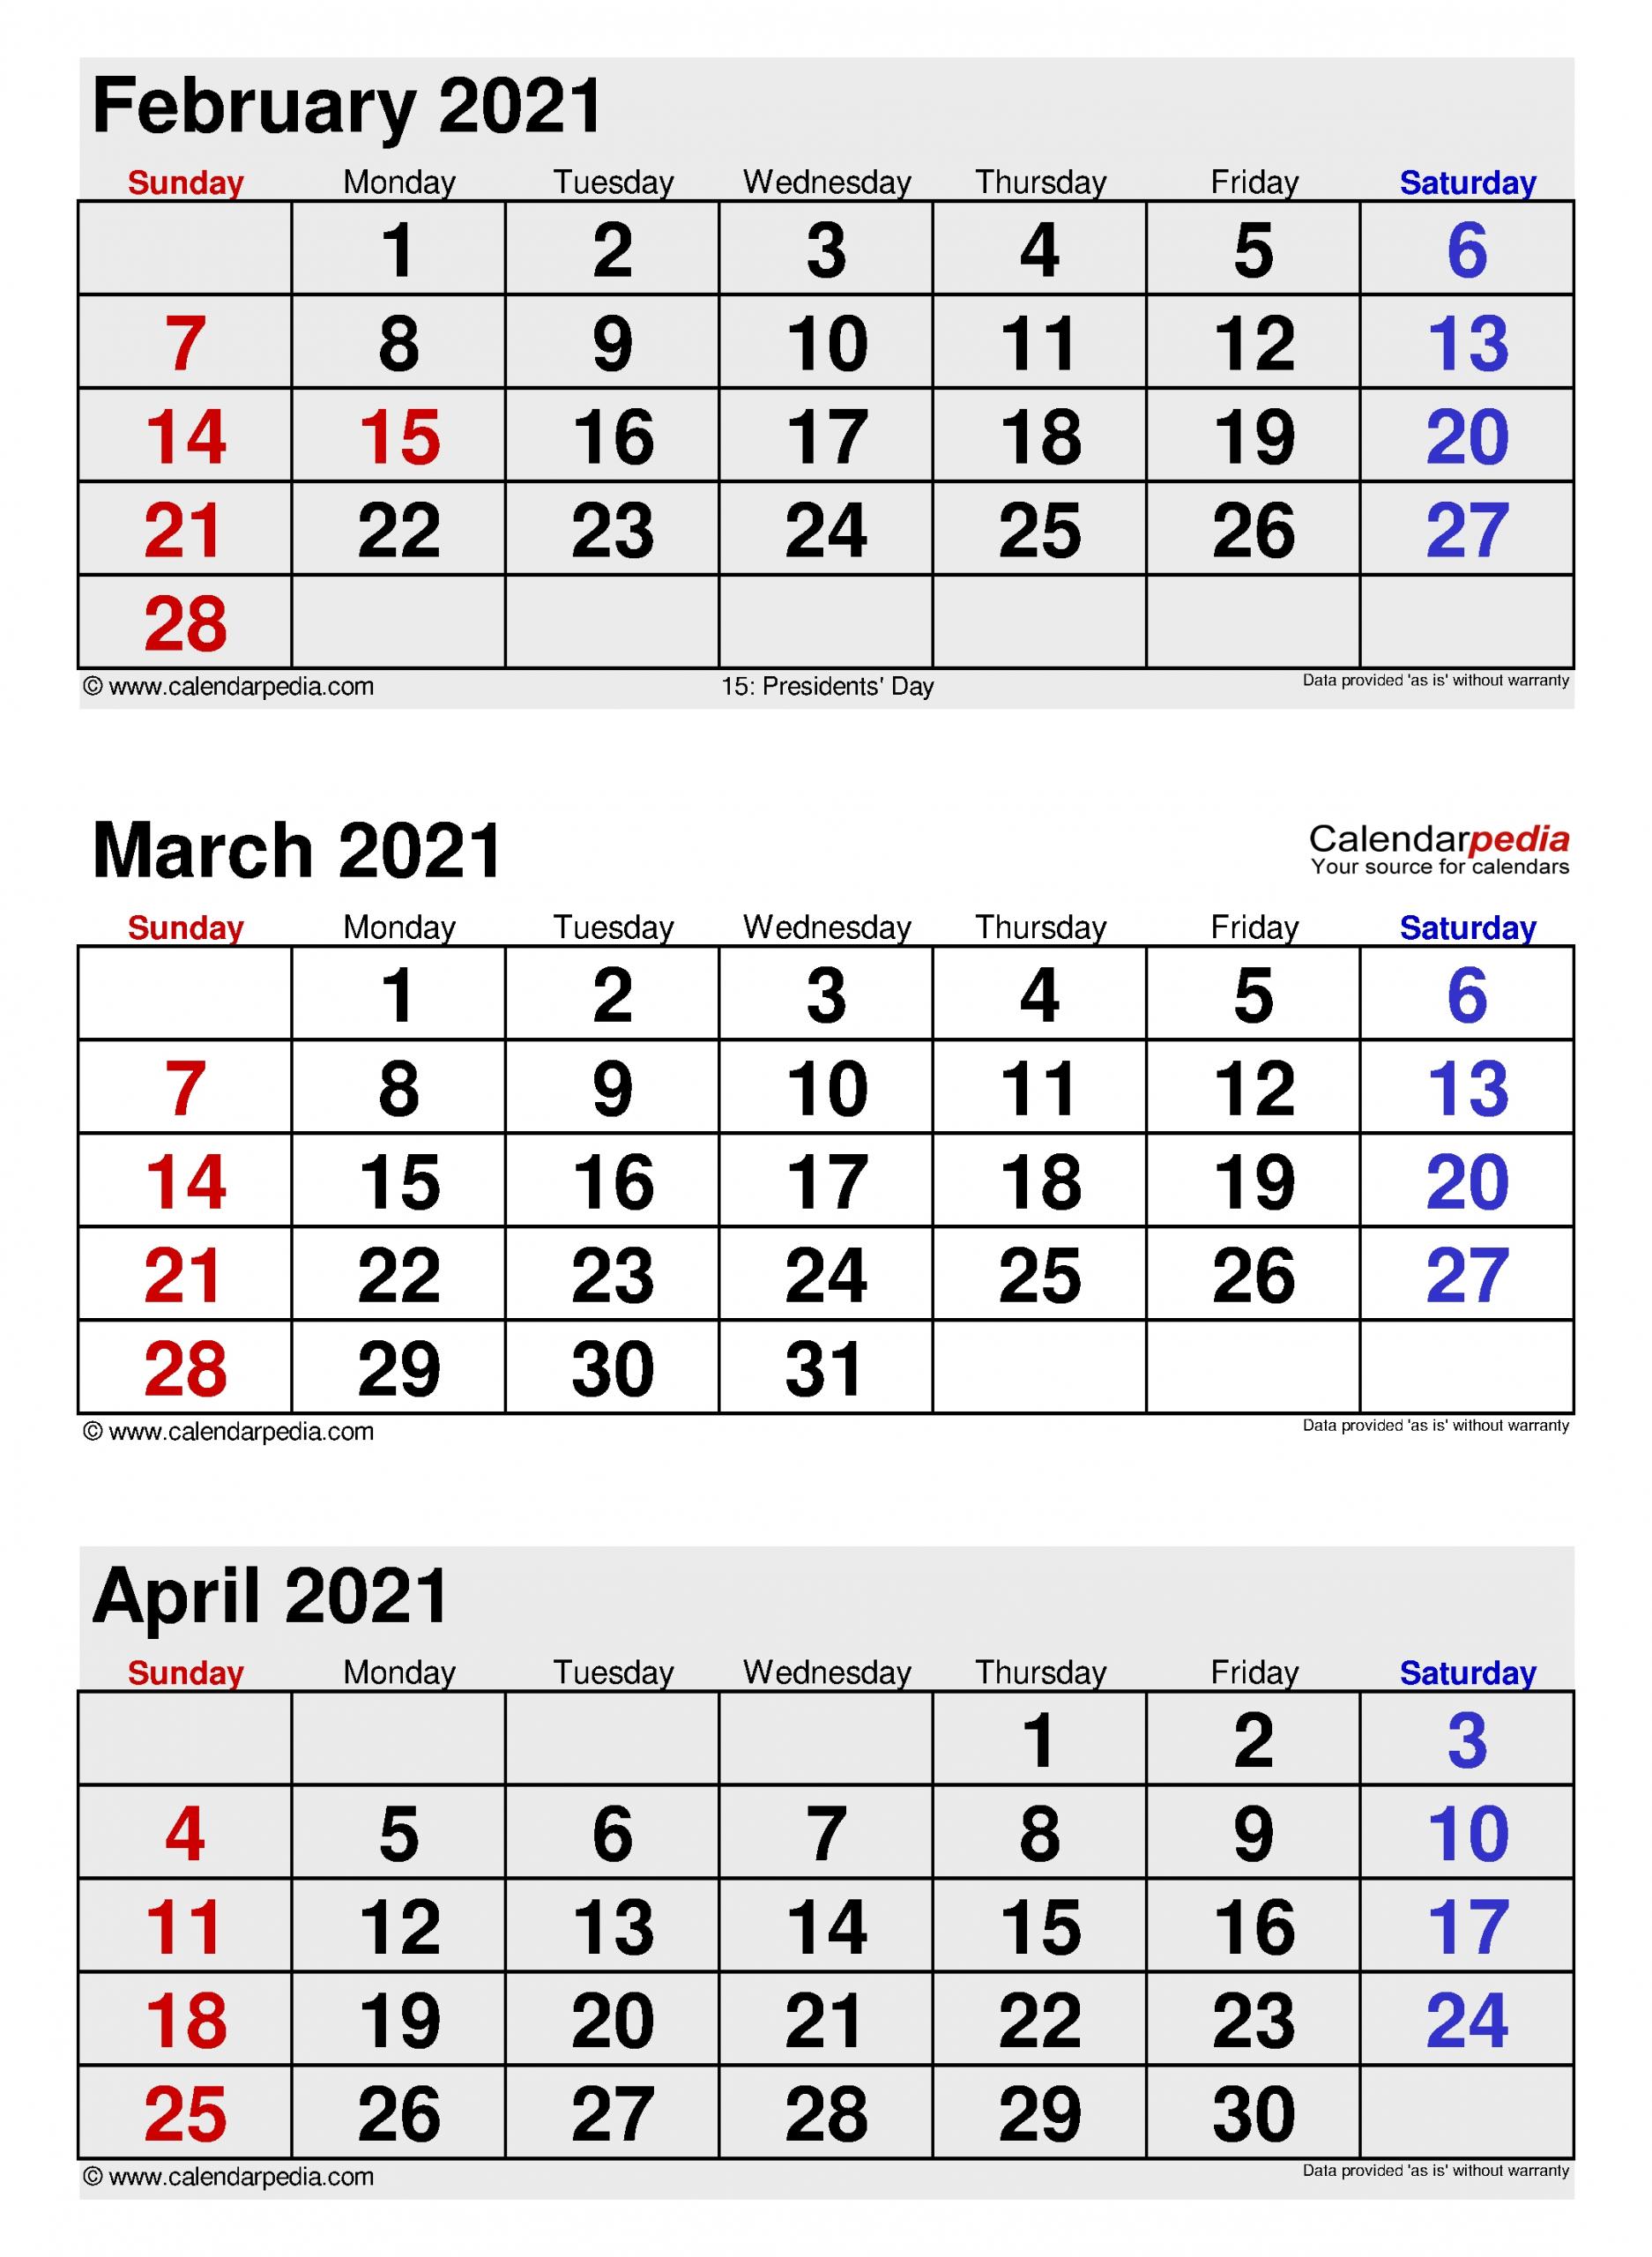 Get Jan Feb Mar Apr Printable Calendar 2021